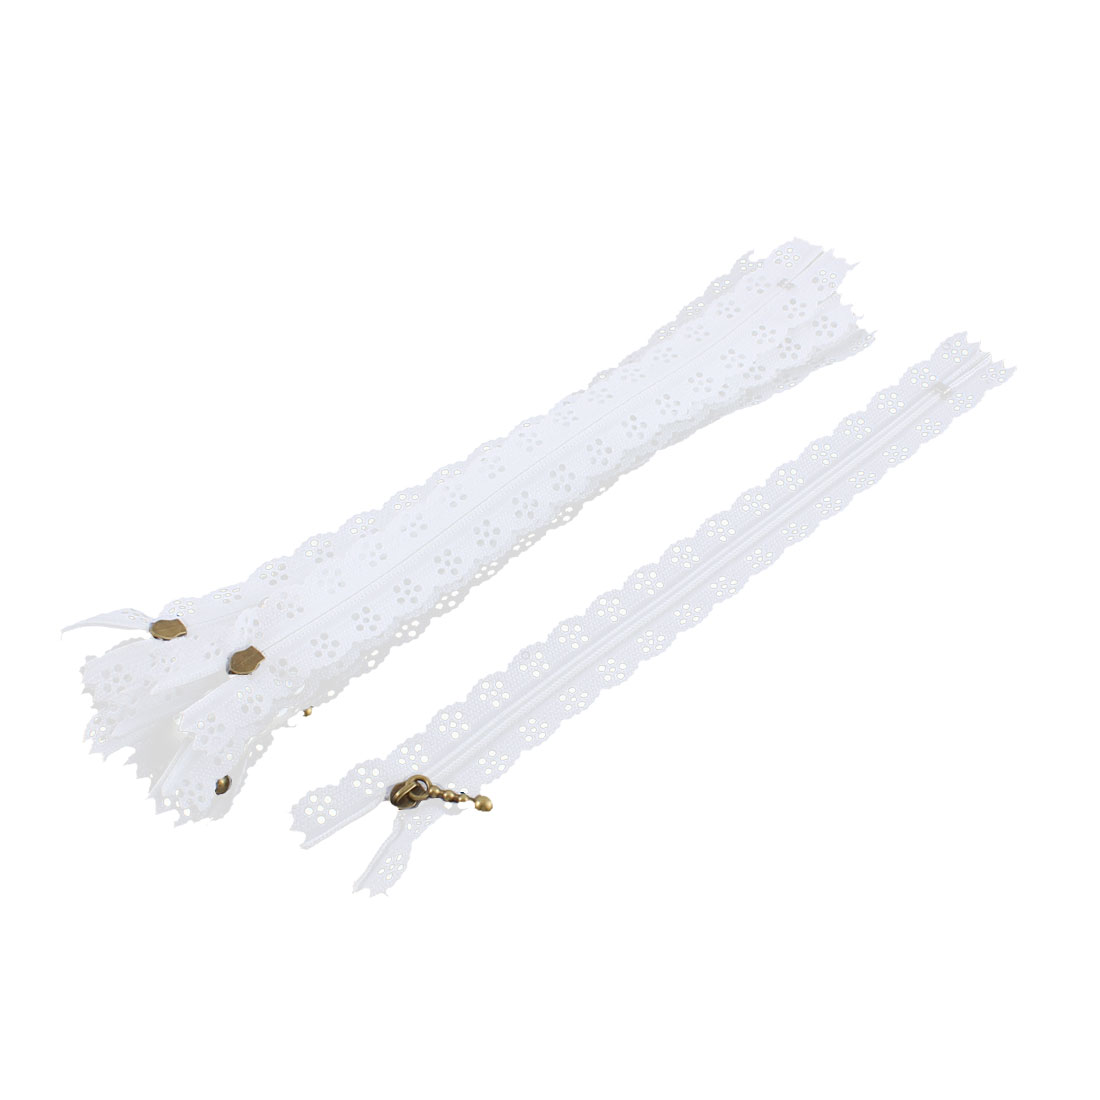 10 Pcs White Nylon Lace Edged Closed End Sewing Zipper Zip